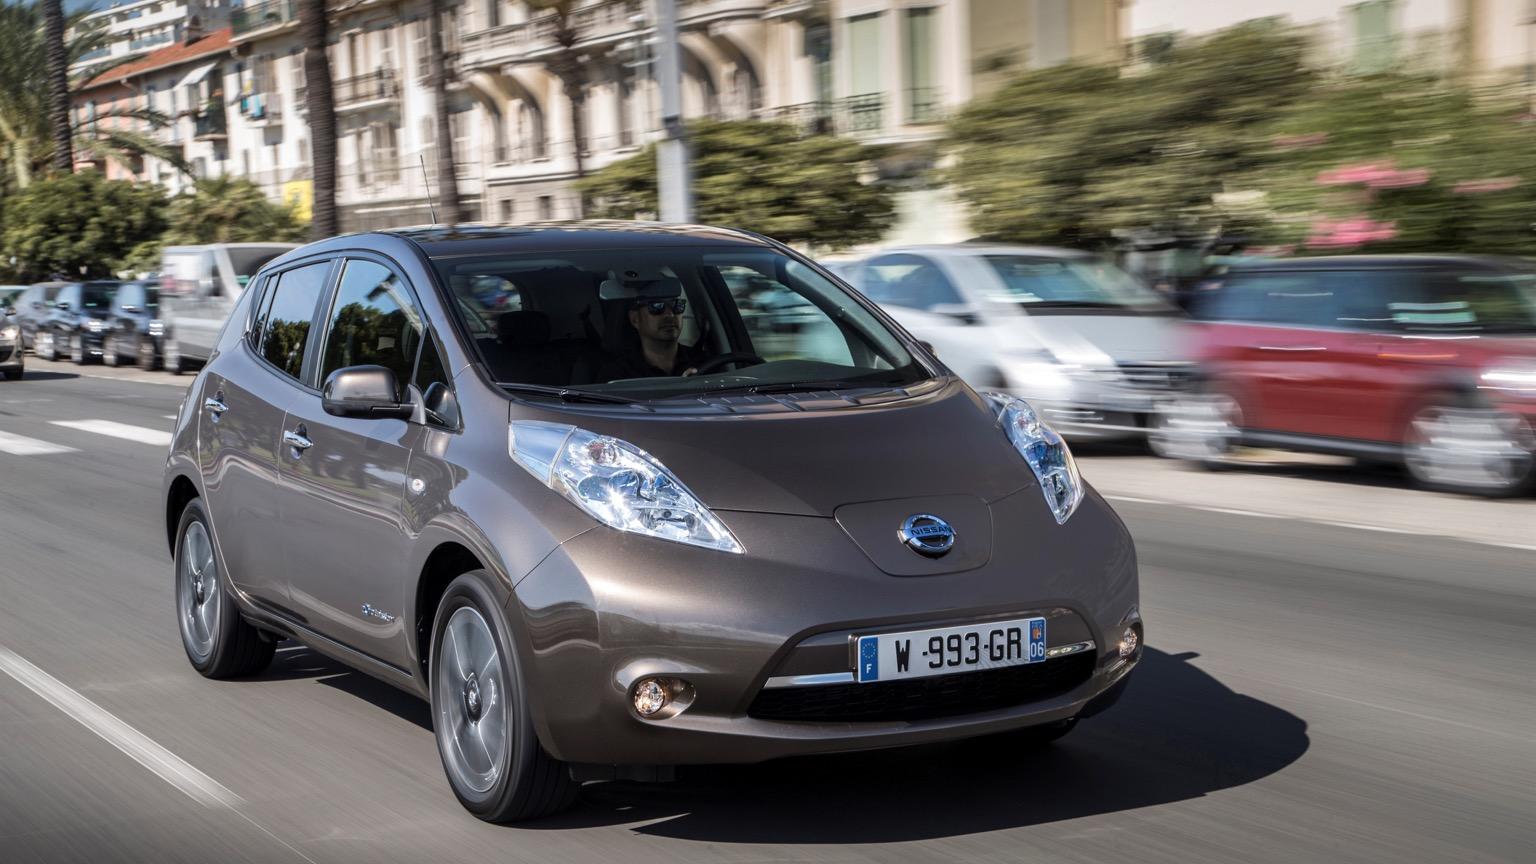 Nissan Leaf 30 kWh (2015)